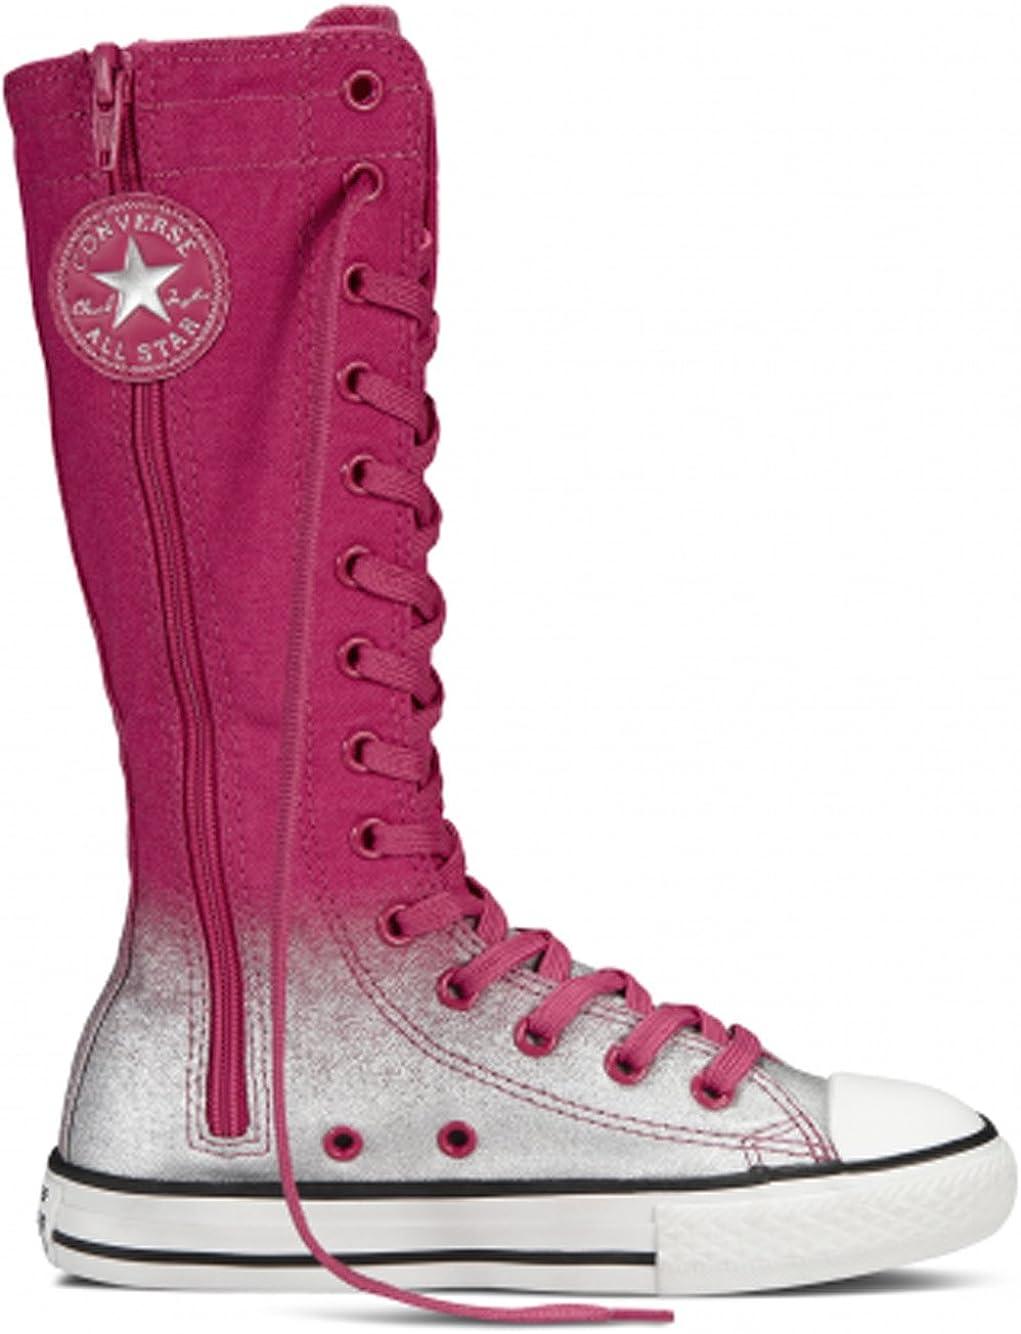 Converse Chuck Taylor All Star Tall XHI